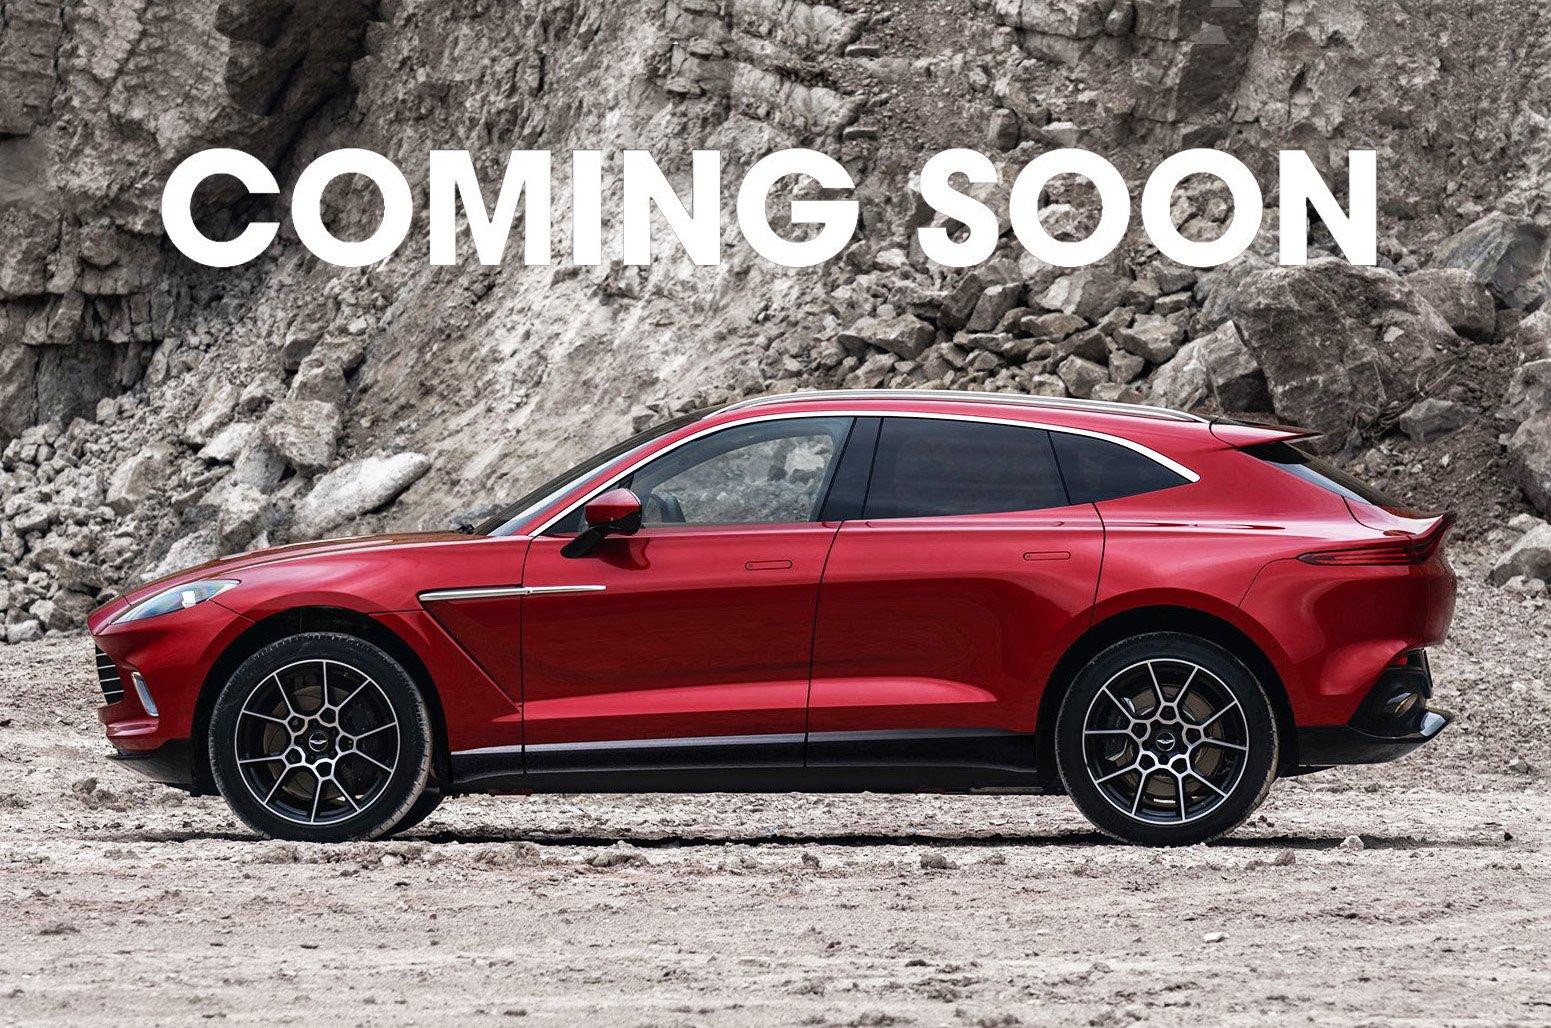 Coming soon - Aston Martin DBX